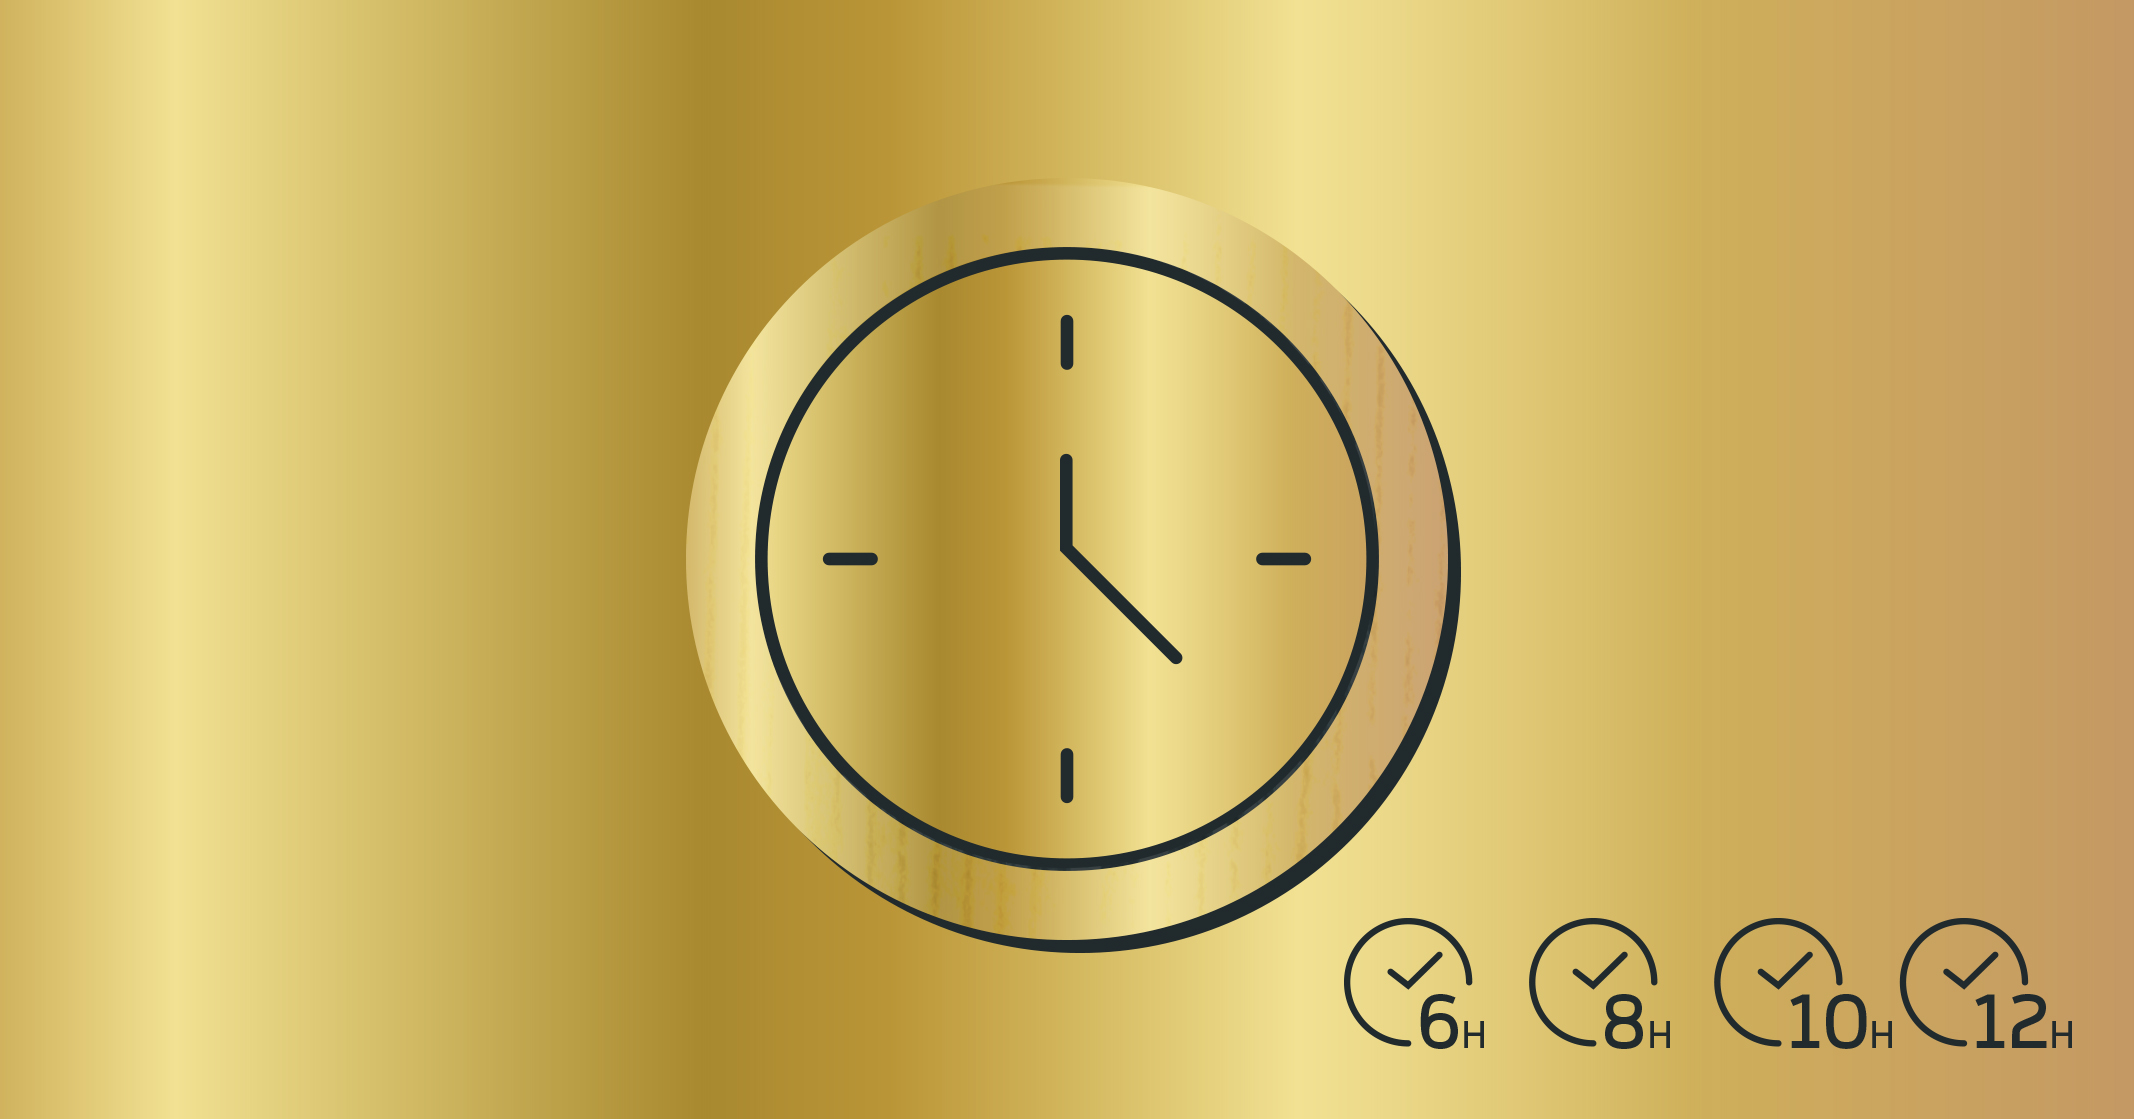 cp013_tempo_13_gold.jpg.jpg